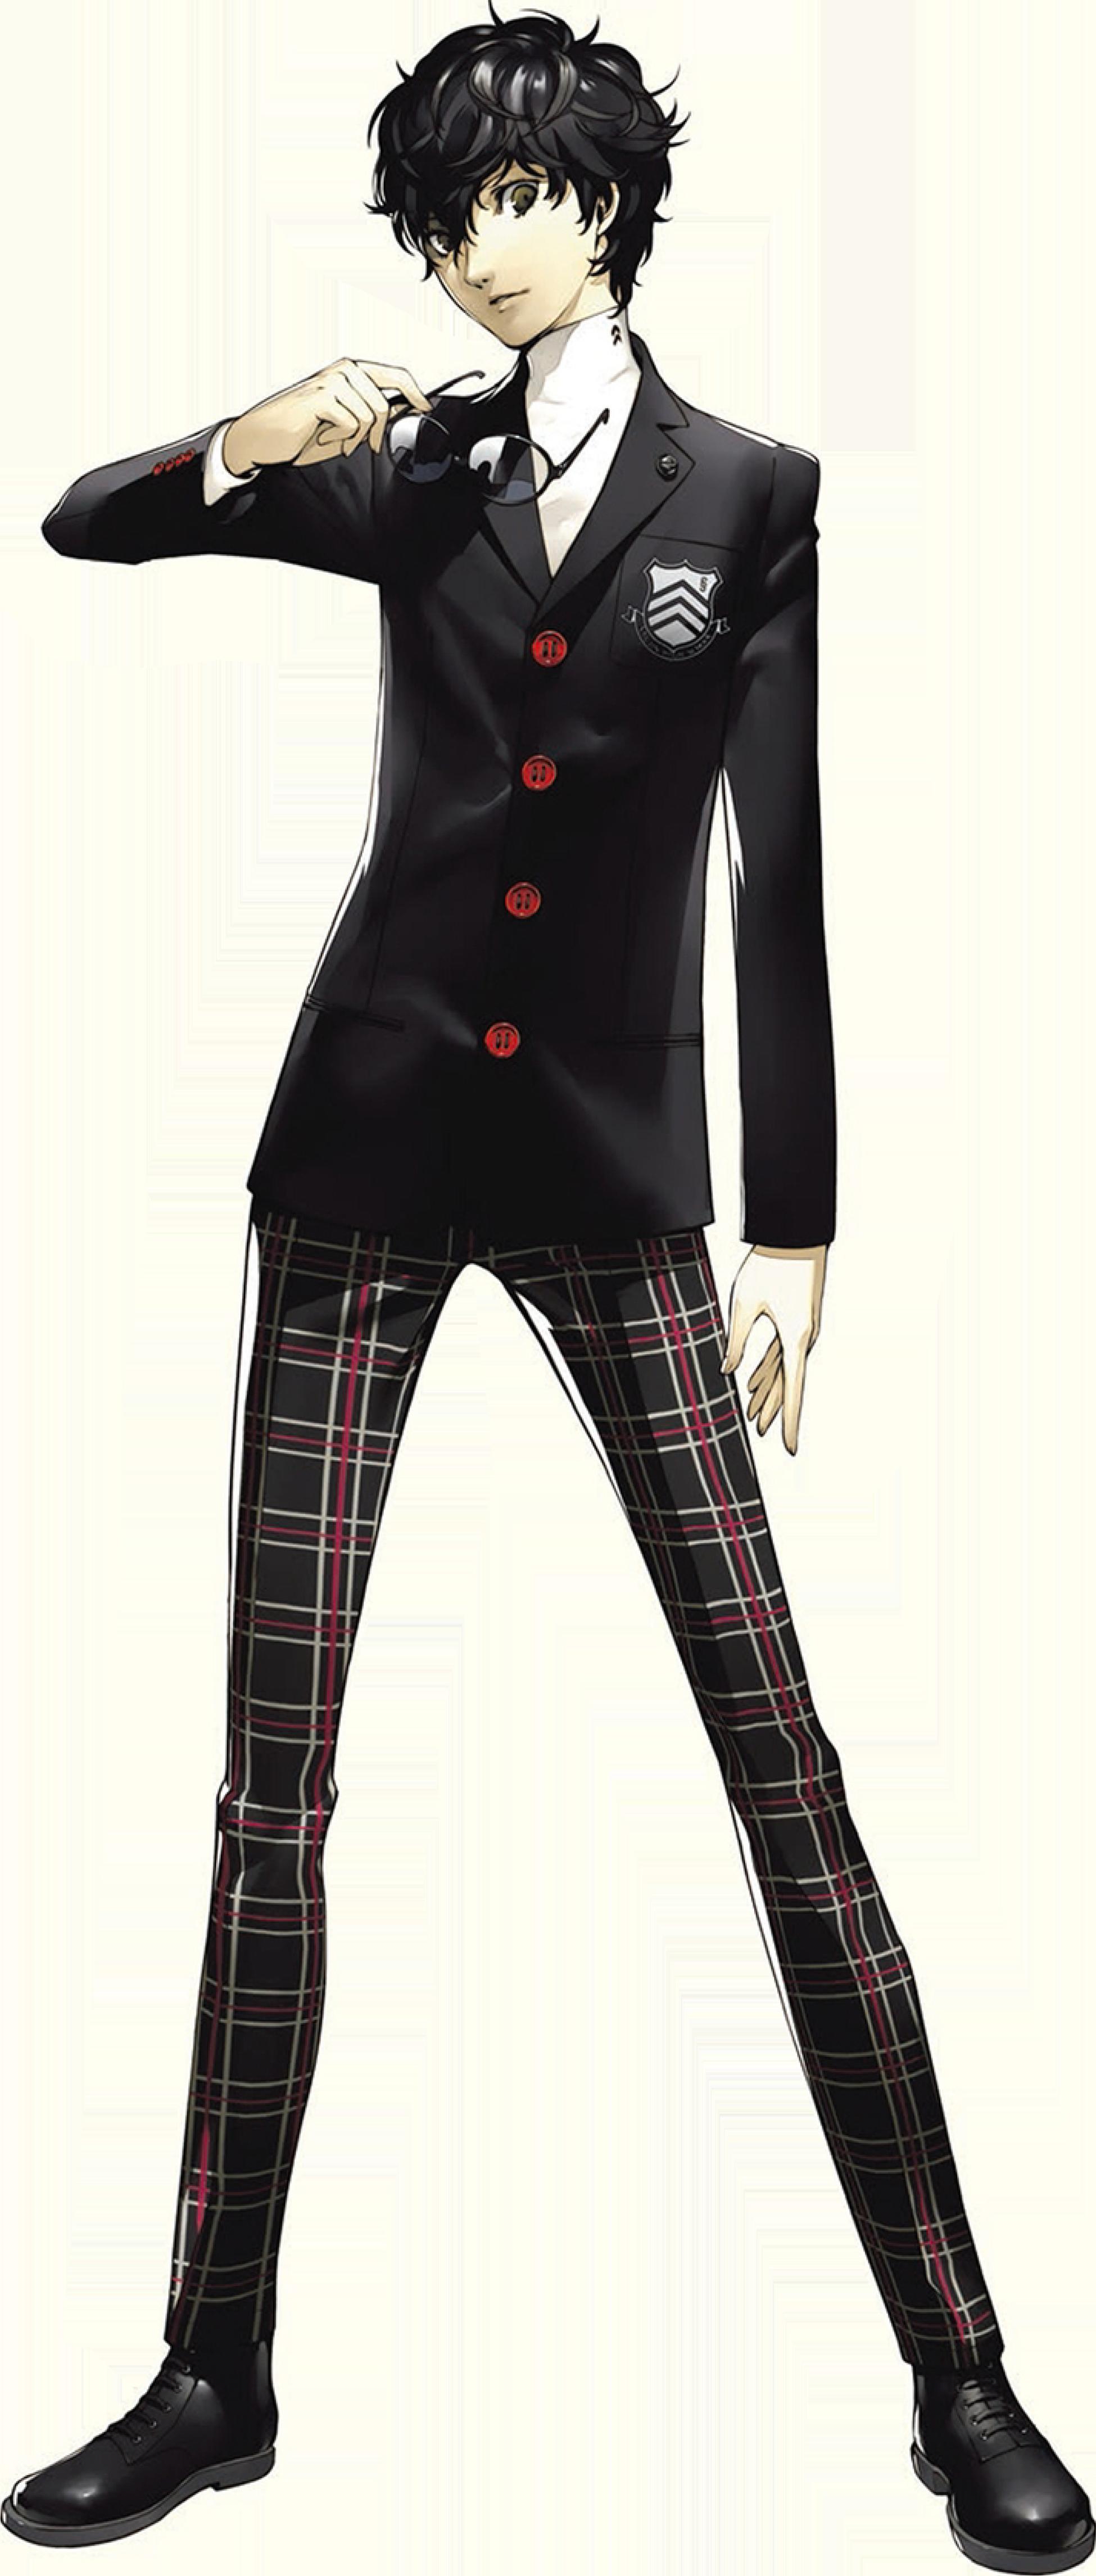 Protagonist (Persona 5) - Megami Tensei Wiki: a Demonic ...